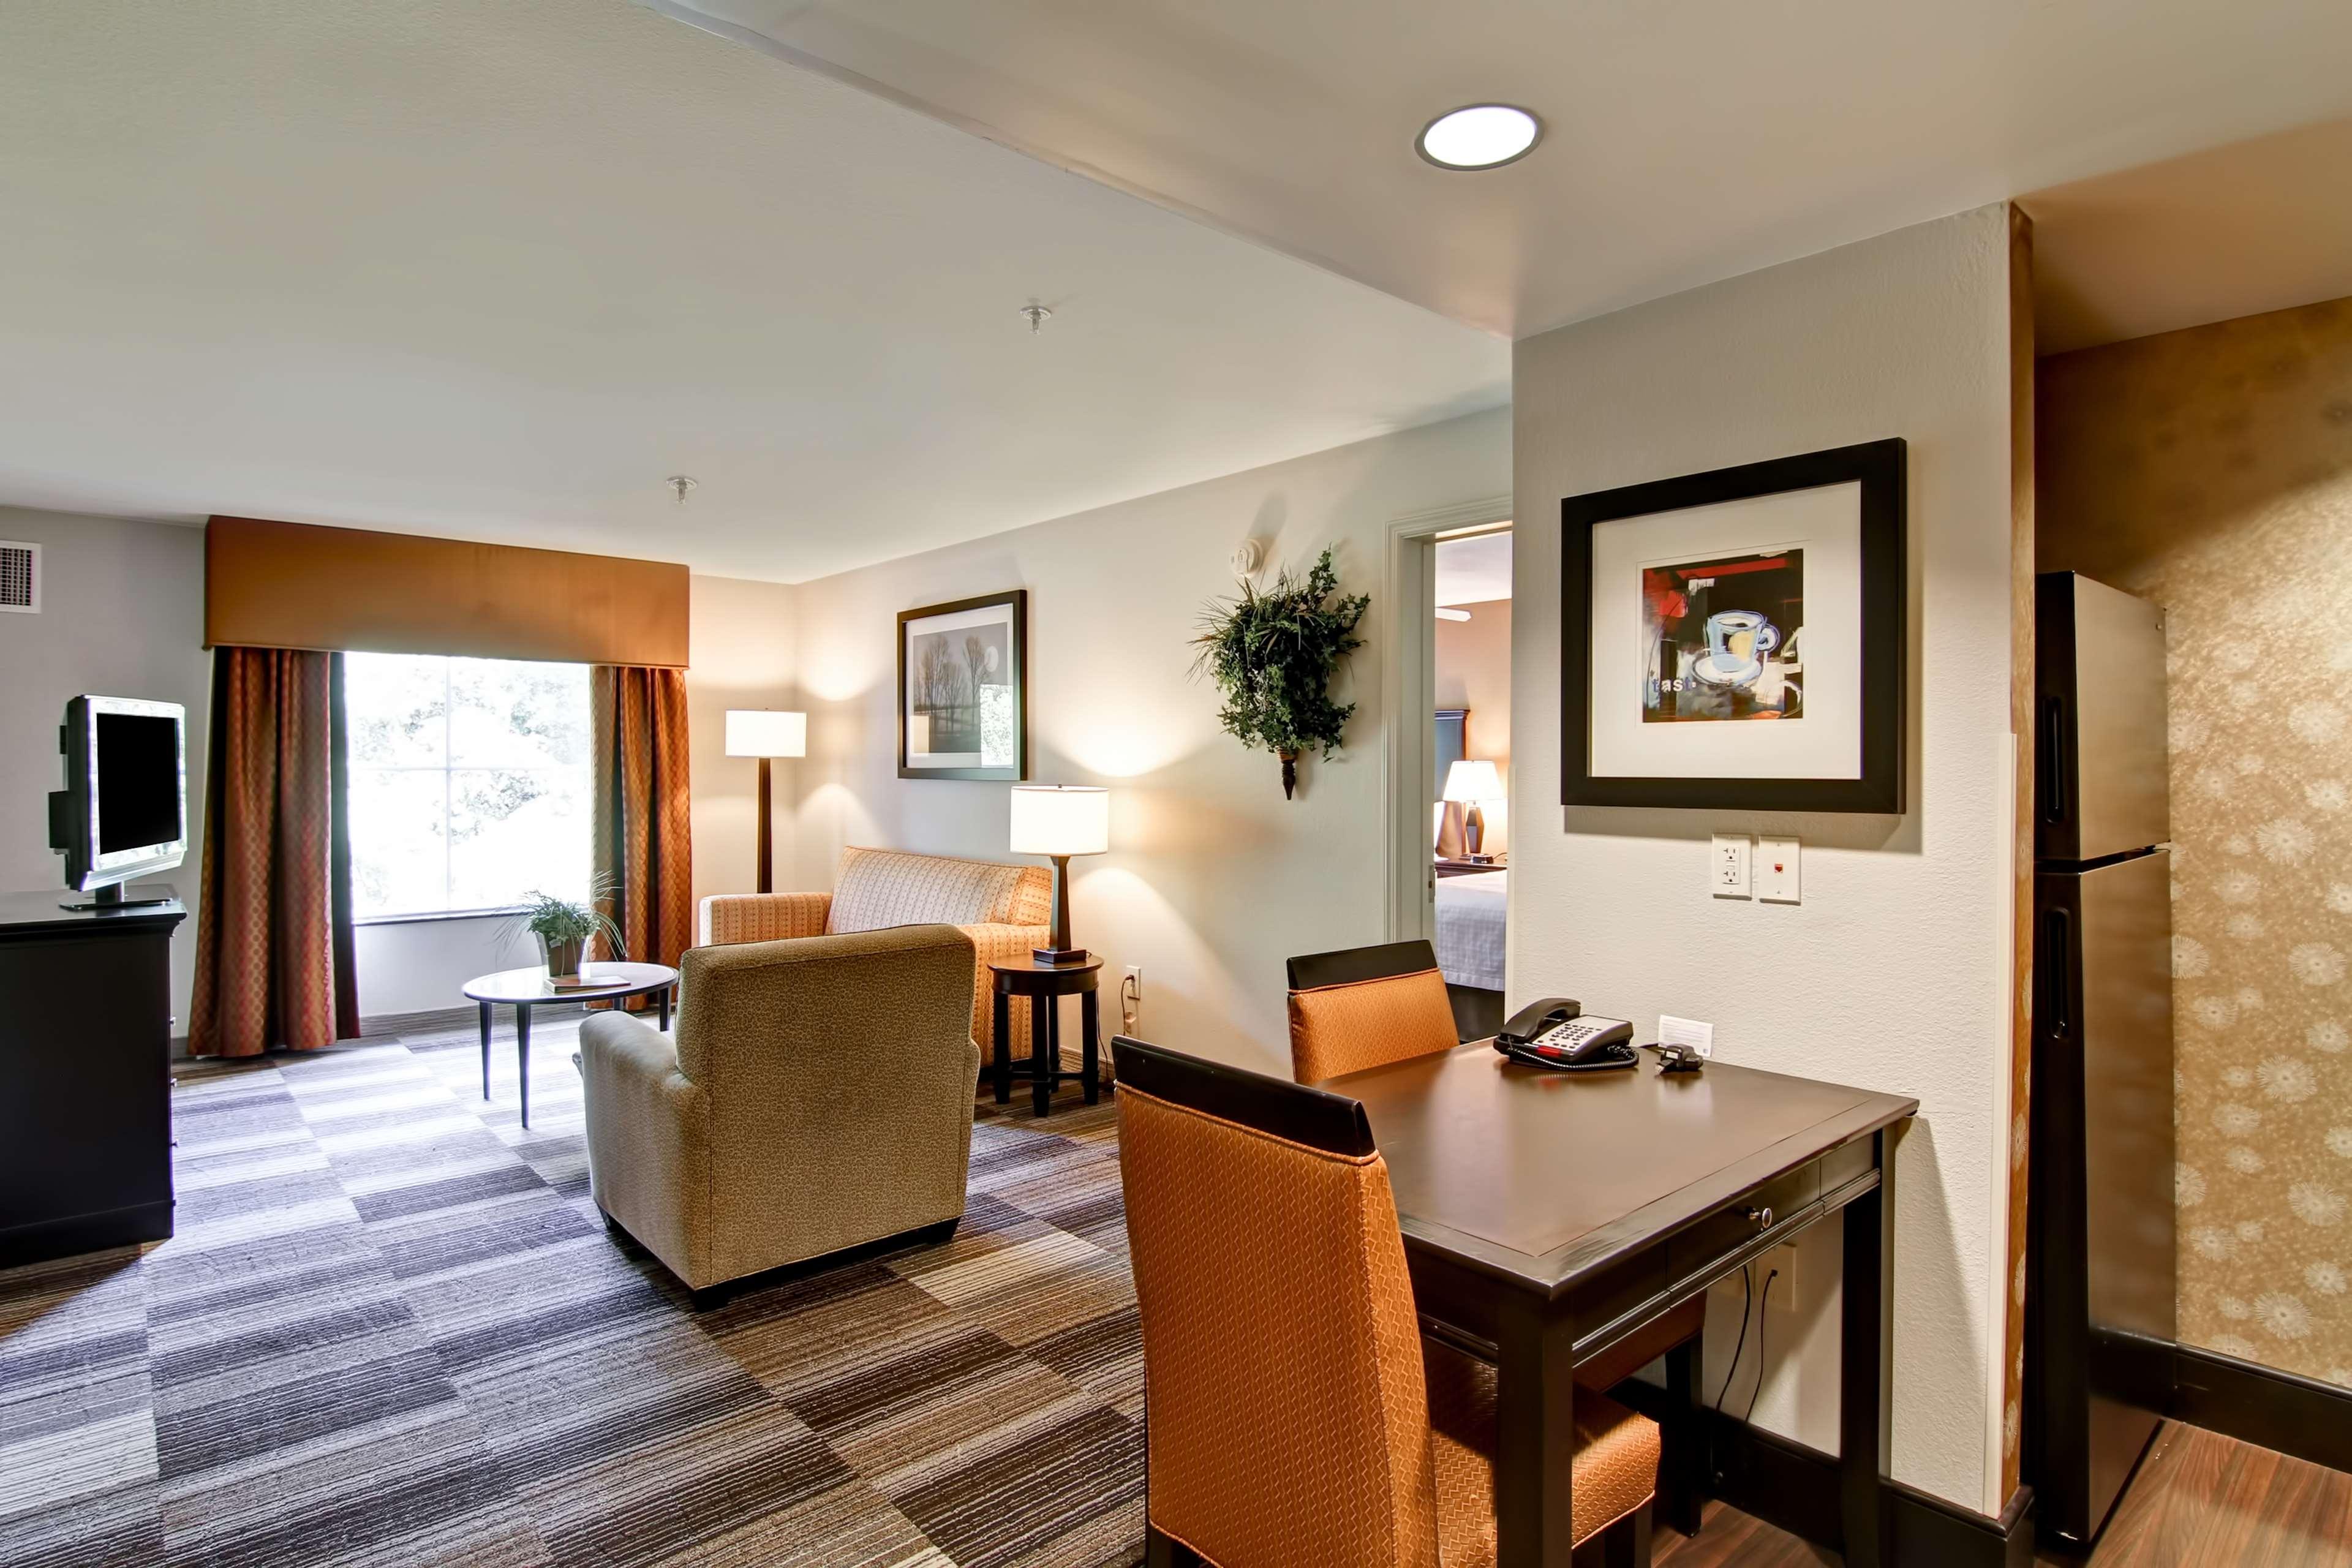 Homewood Suites by Hilton Cincinnati Airport South-Florence image 22